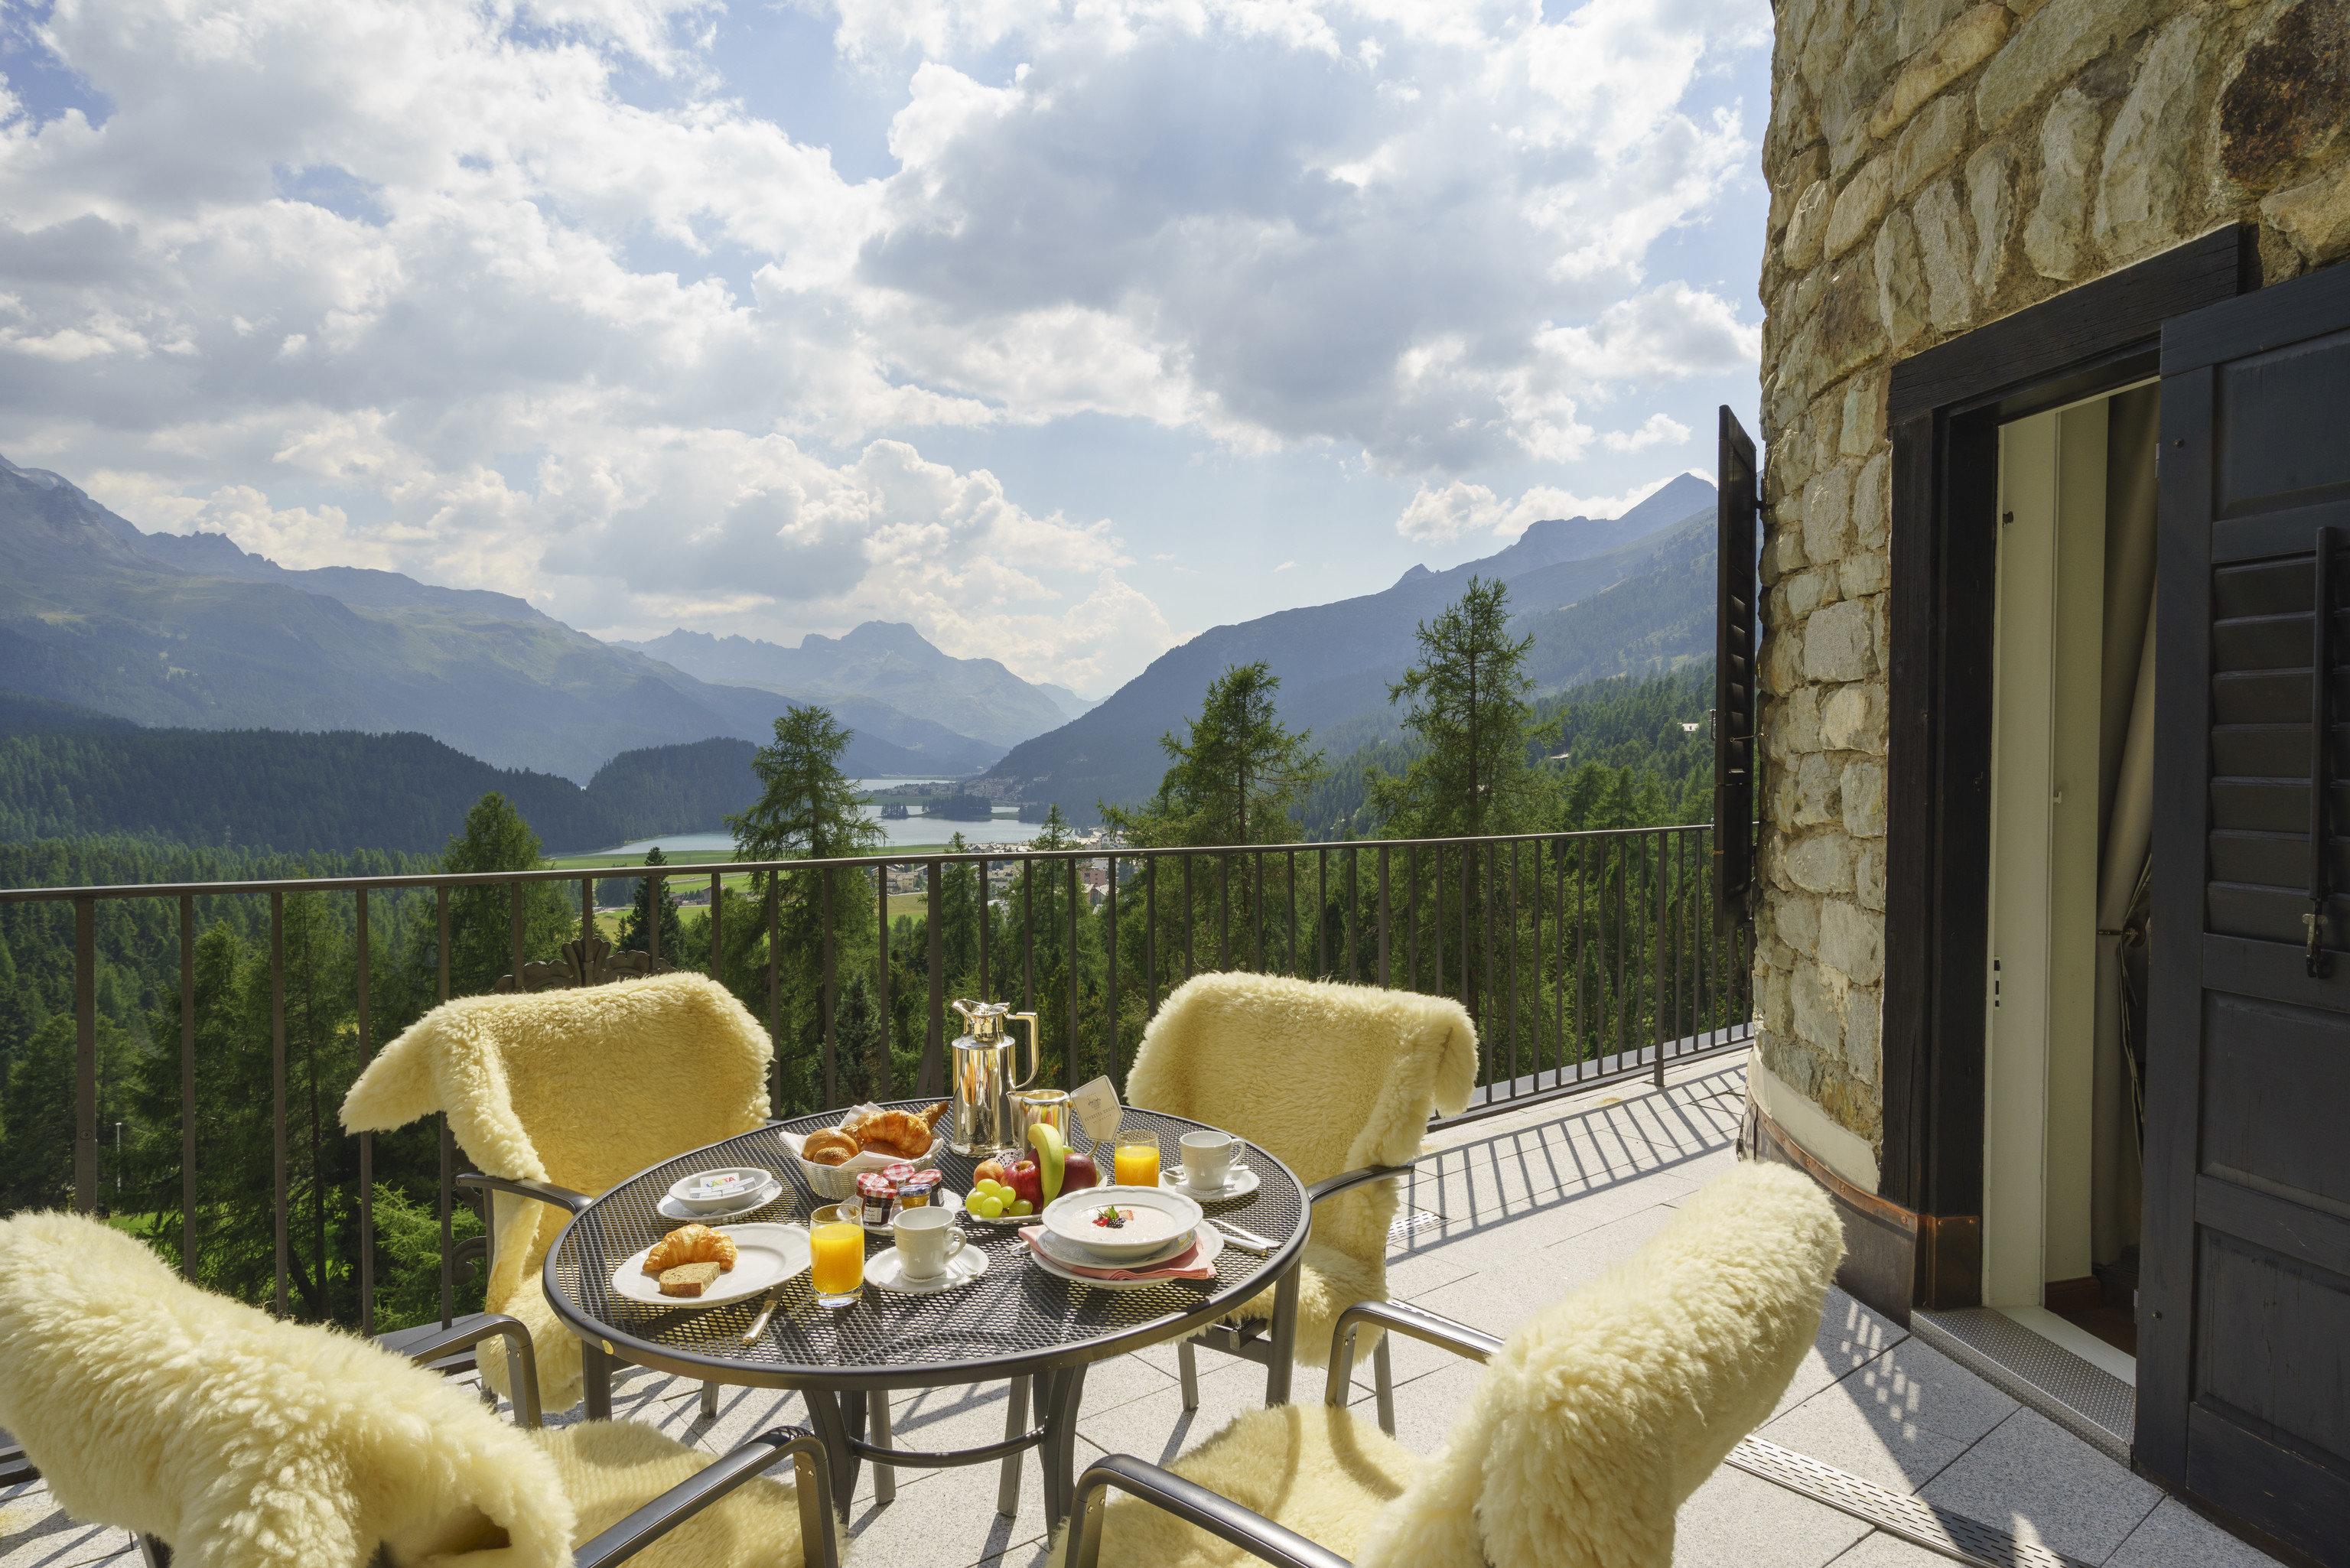 mountain sky property home house cottage Villa outdoor structure Patio landscape penthouse apartment